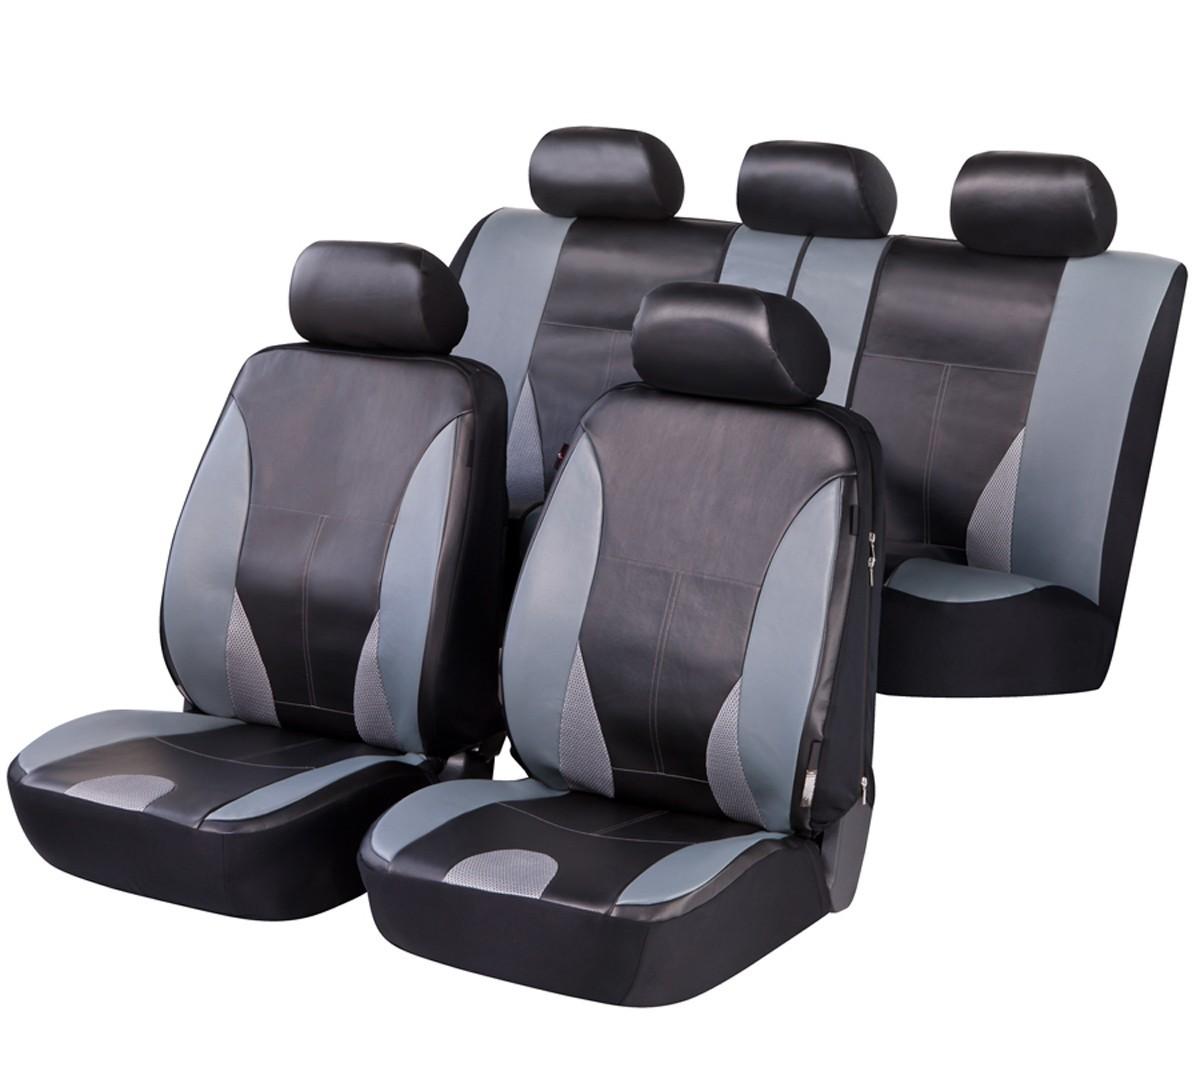 Graue Sitzbezüge für SUBARU FORESTER Autositzbezug Komplett